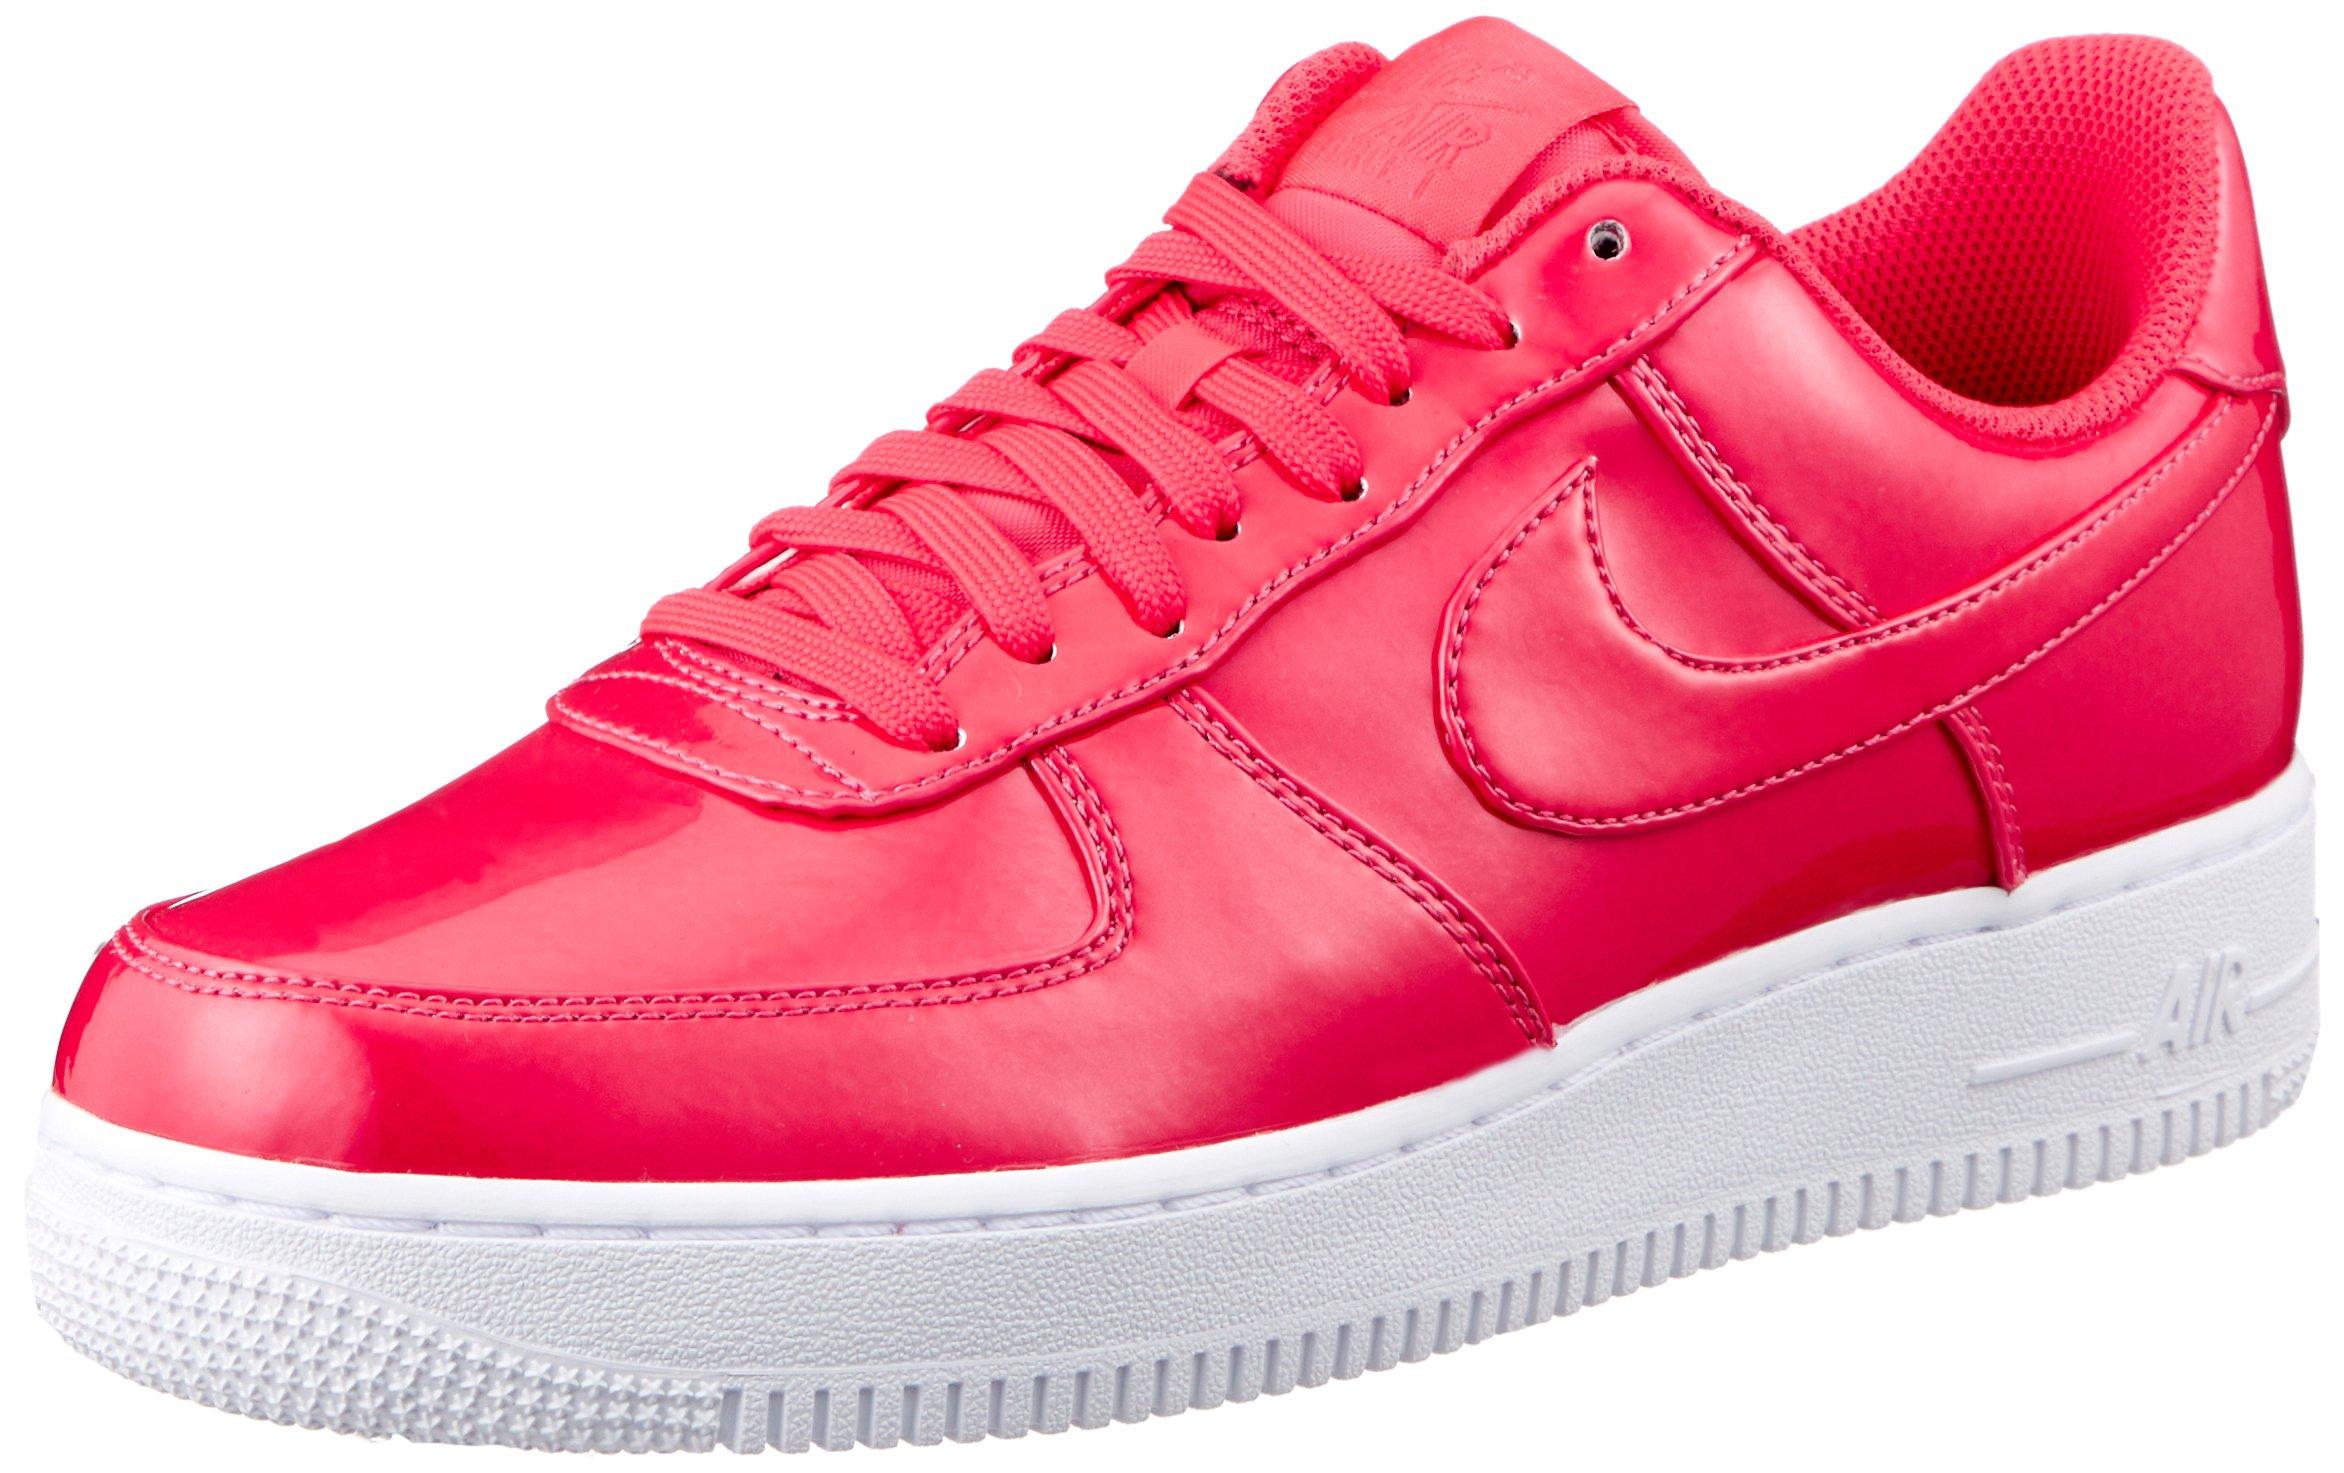 huge sale ec234 0056f Galleon - NIKE Air Force 1  07 LV8 UV Men s Shoes Siren Red White Aj9505-600  (7.5 D(M) US)